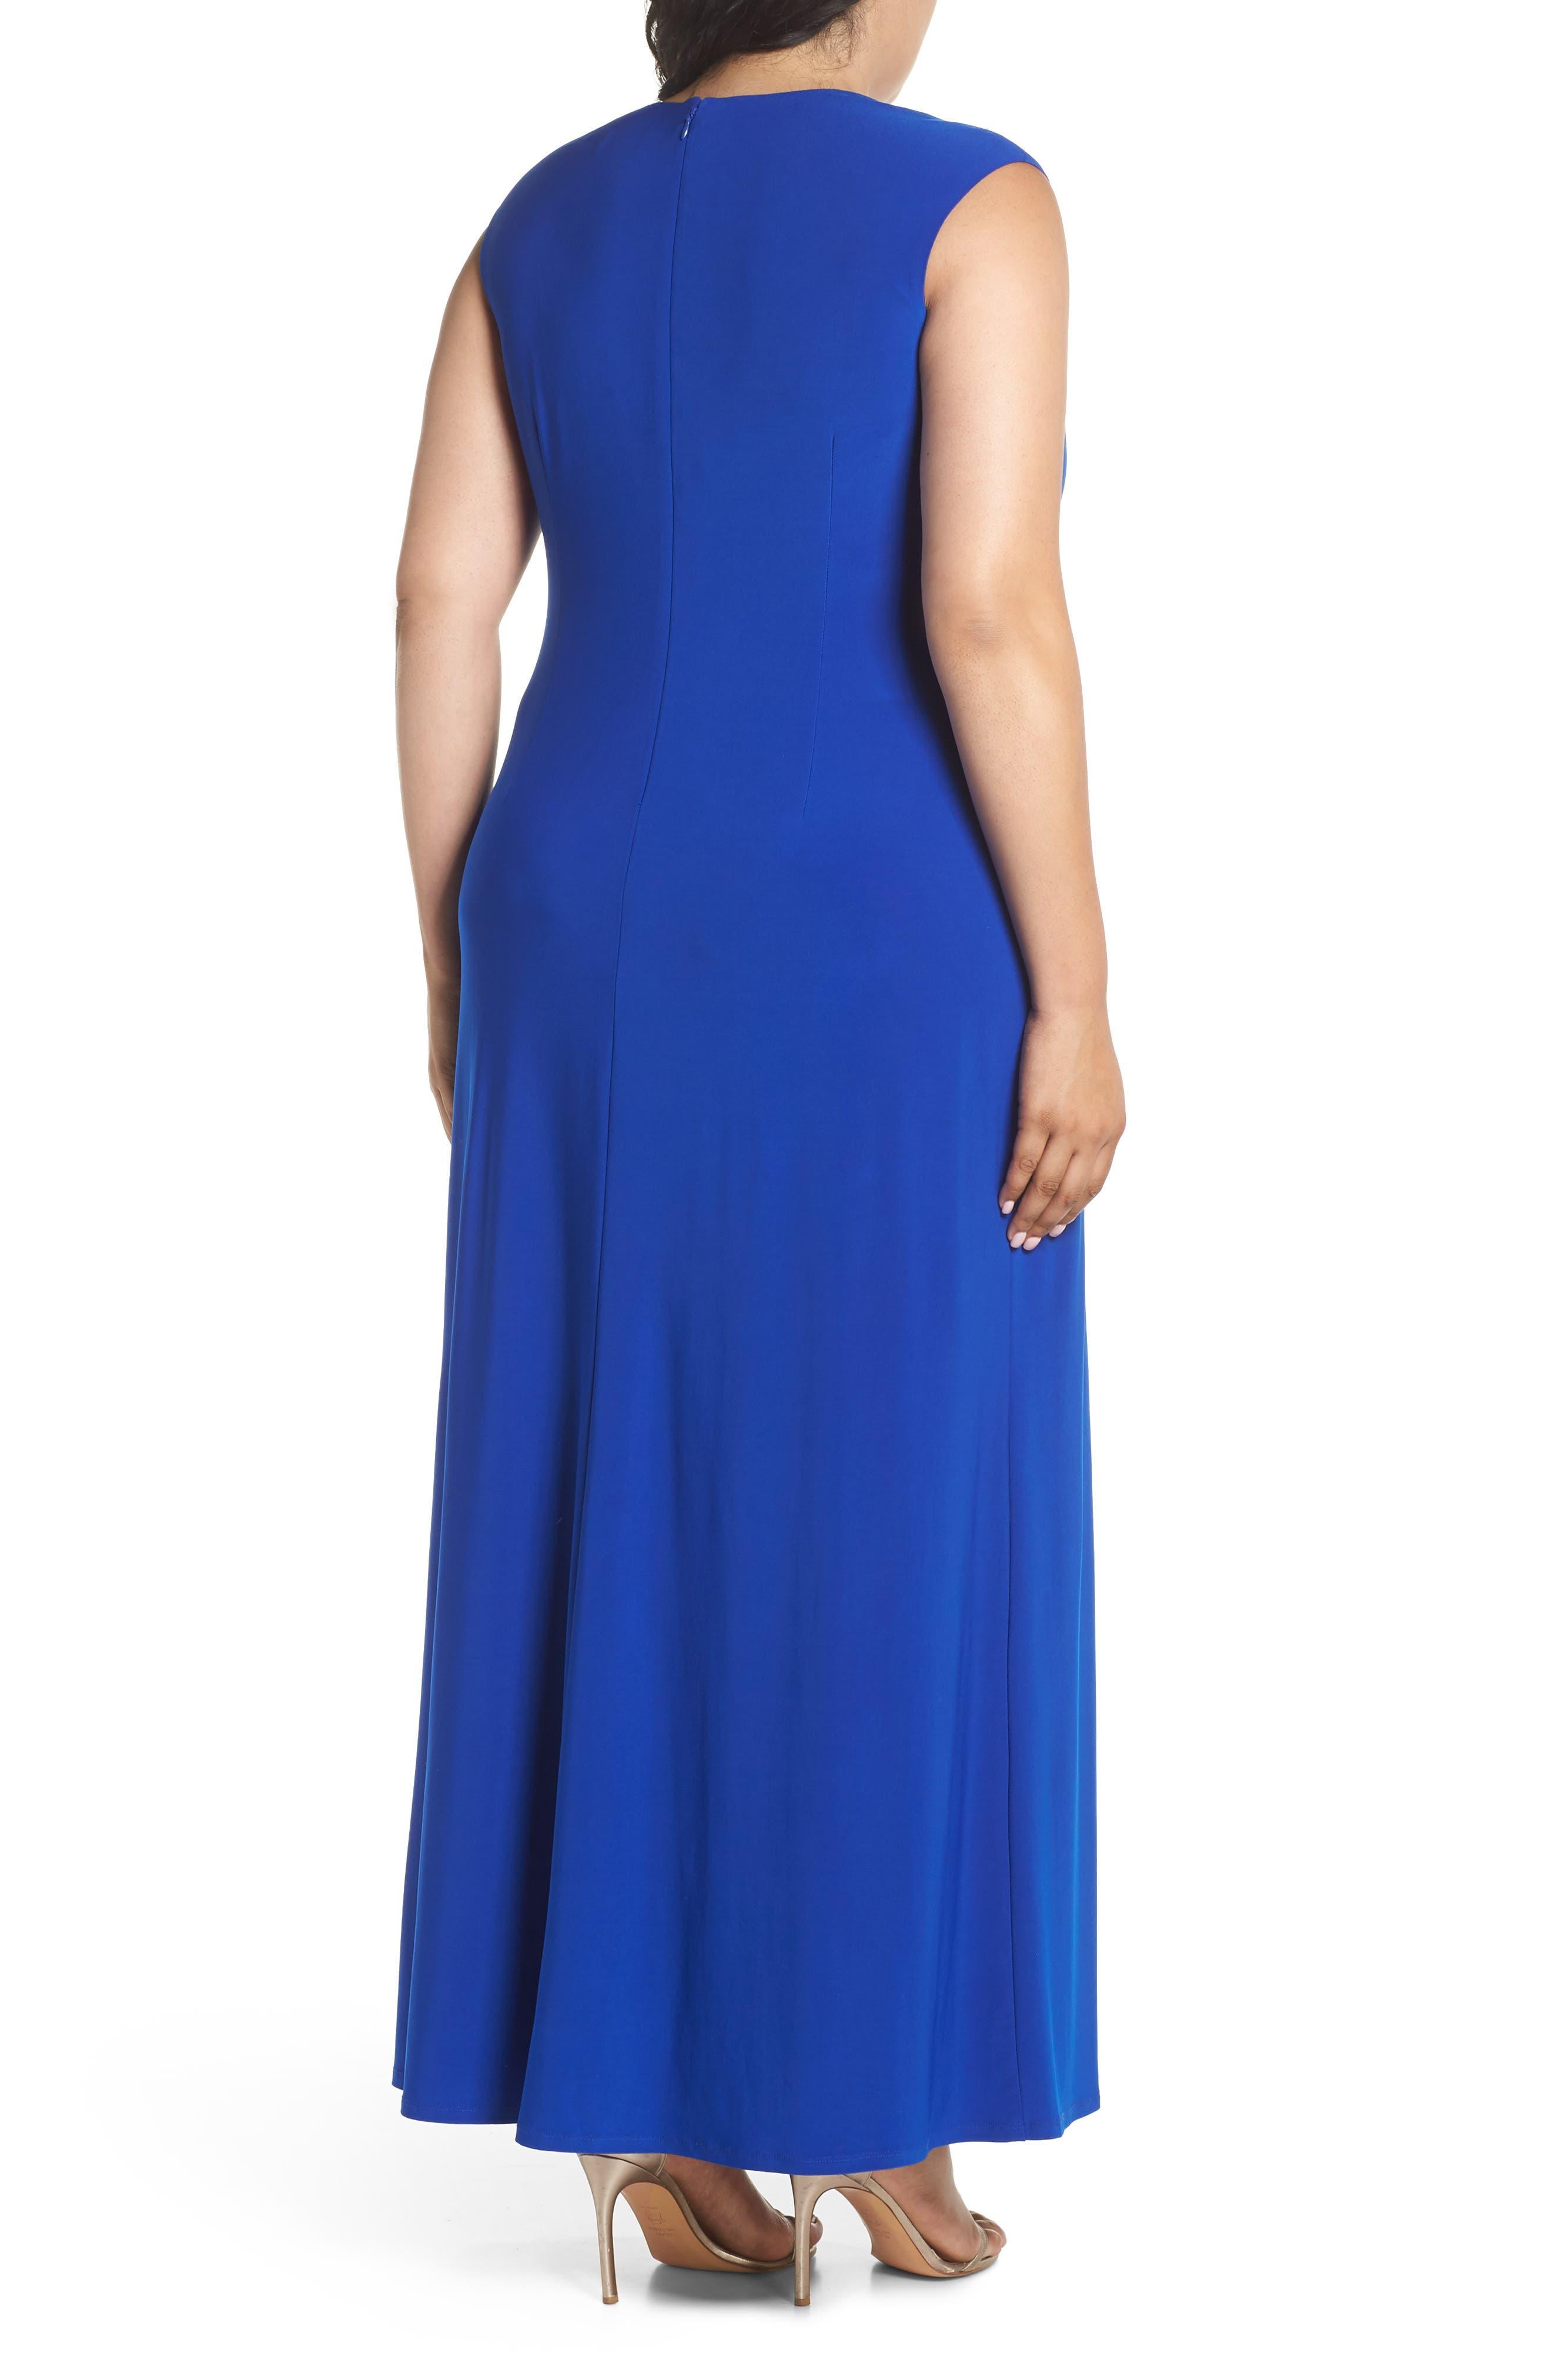 Embellished Surplice Dress,                             Alternate thumbnail 2, color,                             430